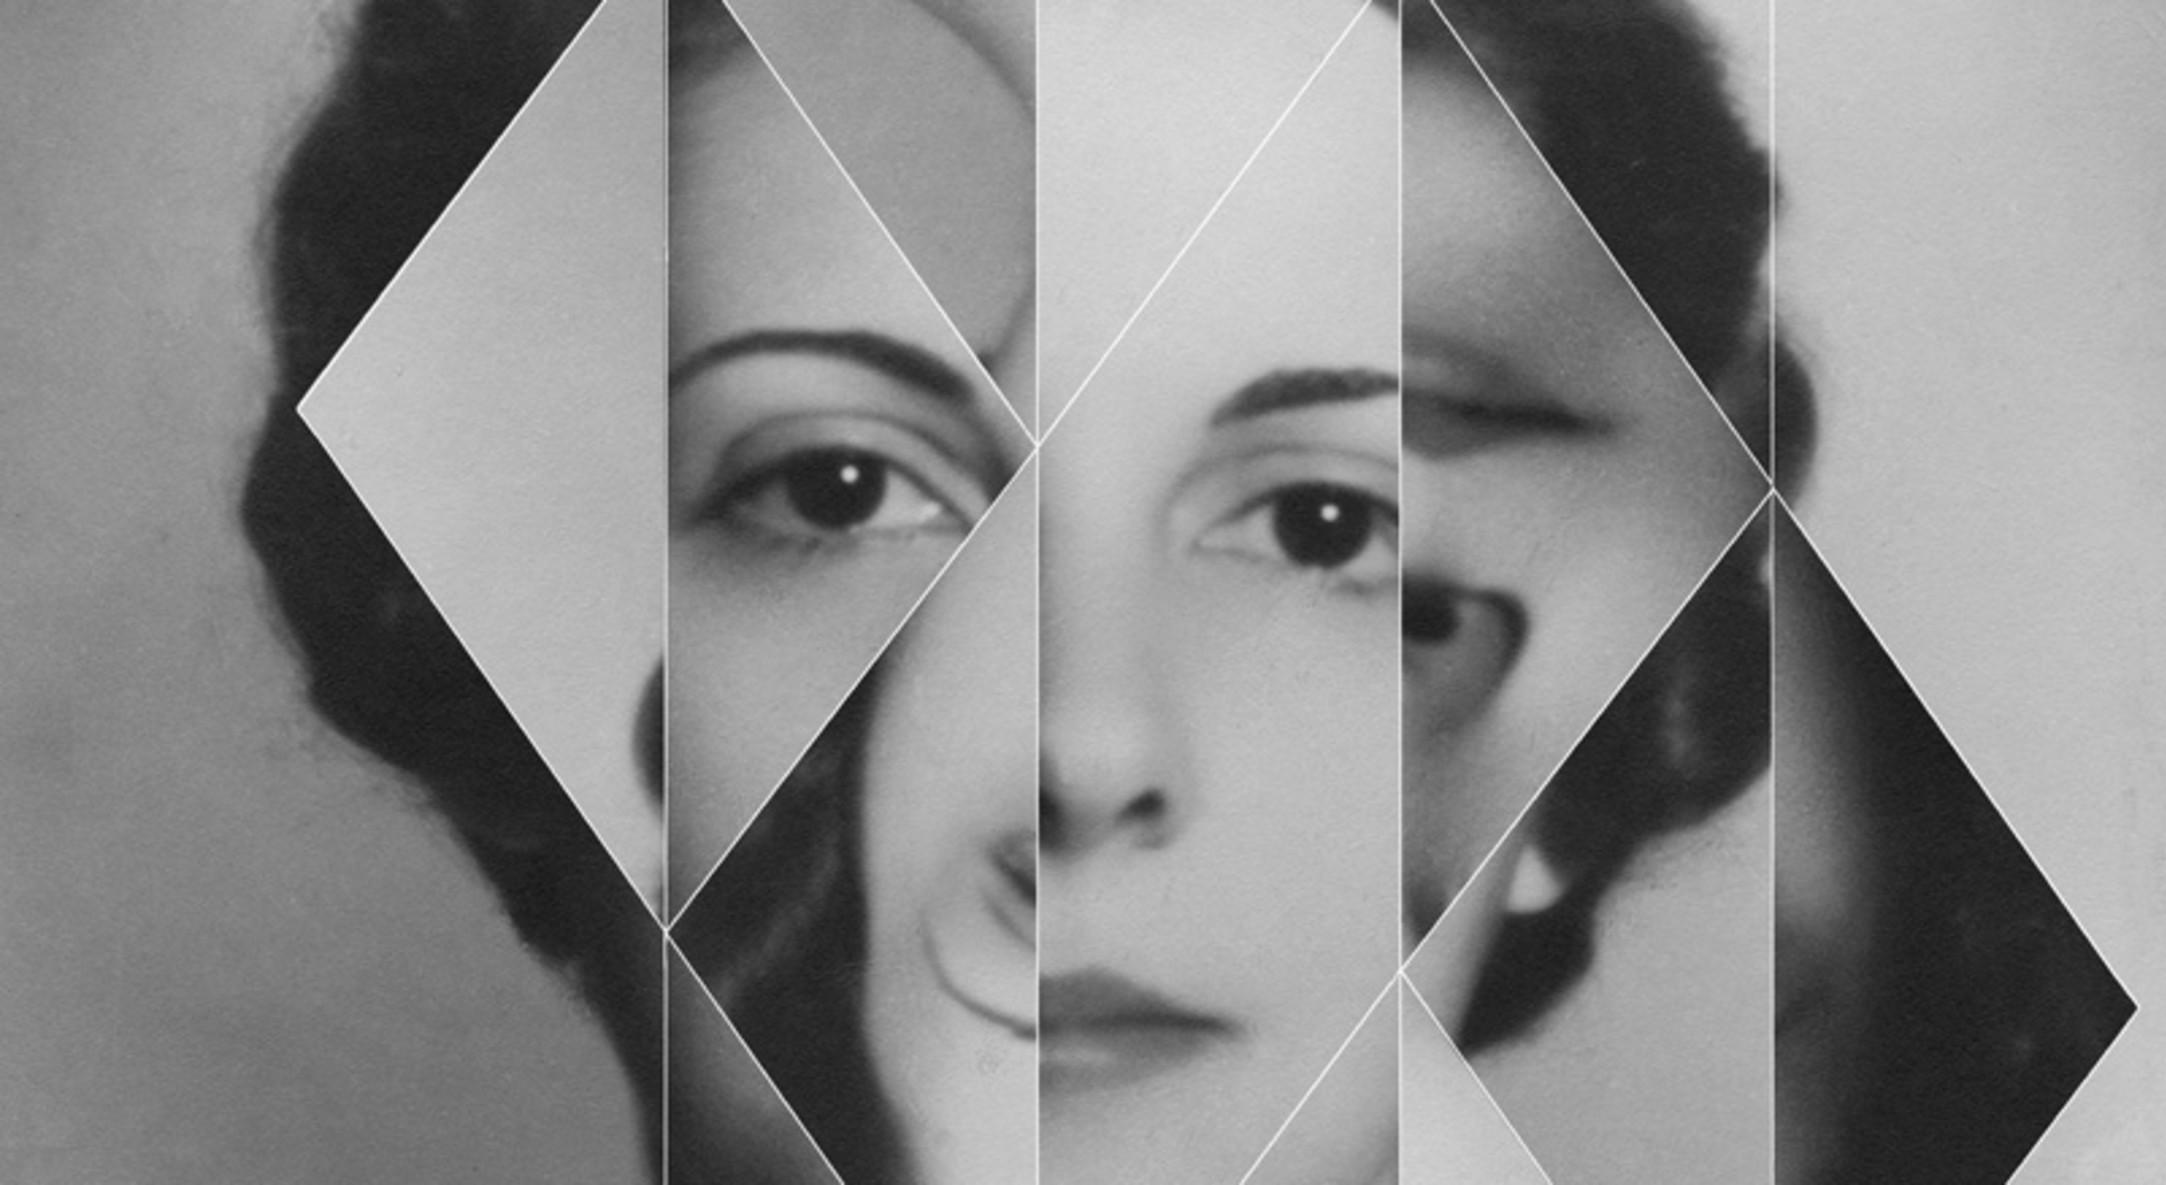 "Detail of Andrea Geyer, Constellations (María Teresa de Rojas ""Titina""), 2018, Hand-cut archival print on rag paper, 80 x 59.1 cm, 31 1/2 x 23 1/4 in"